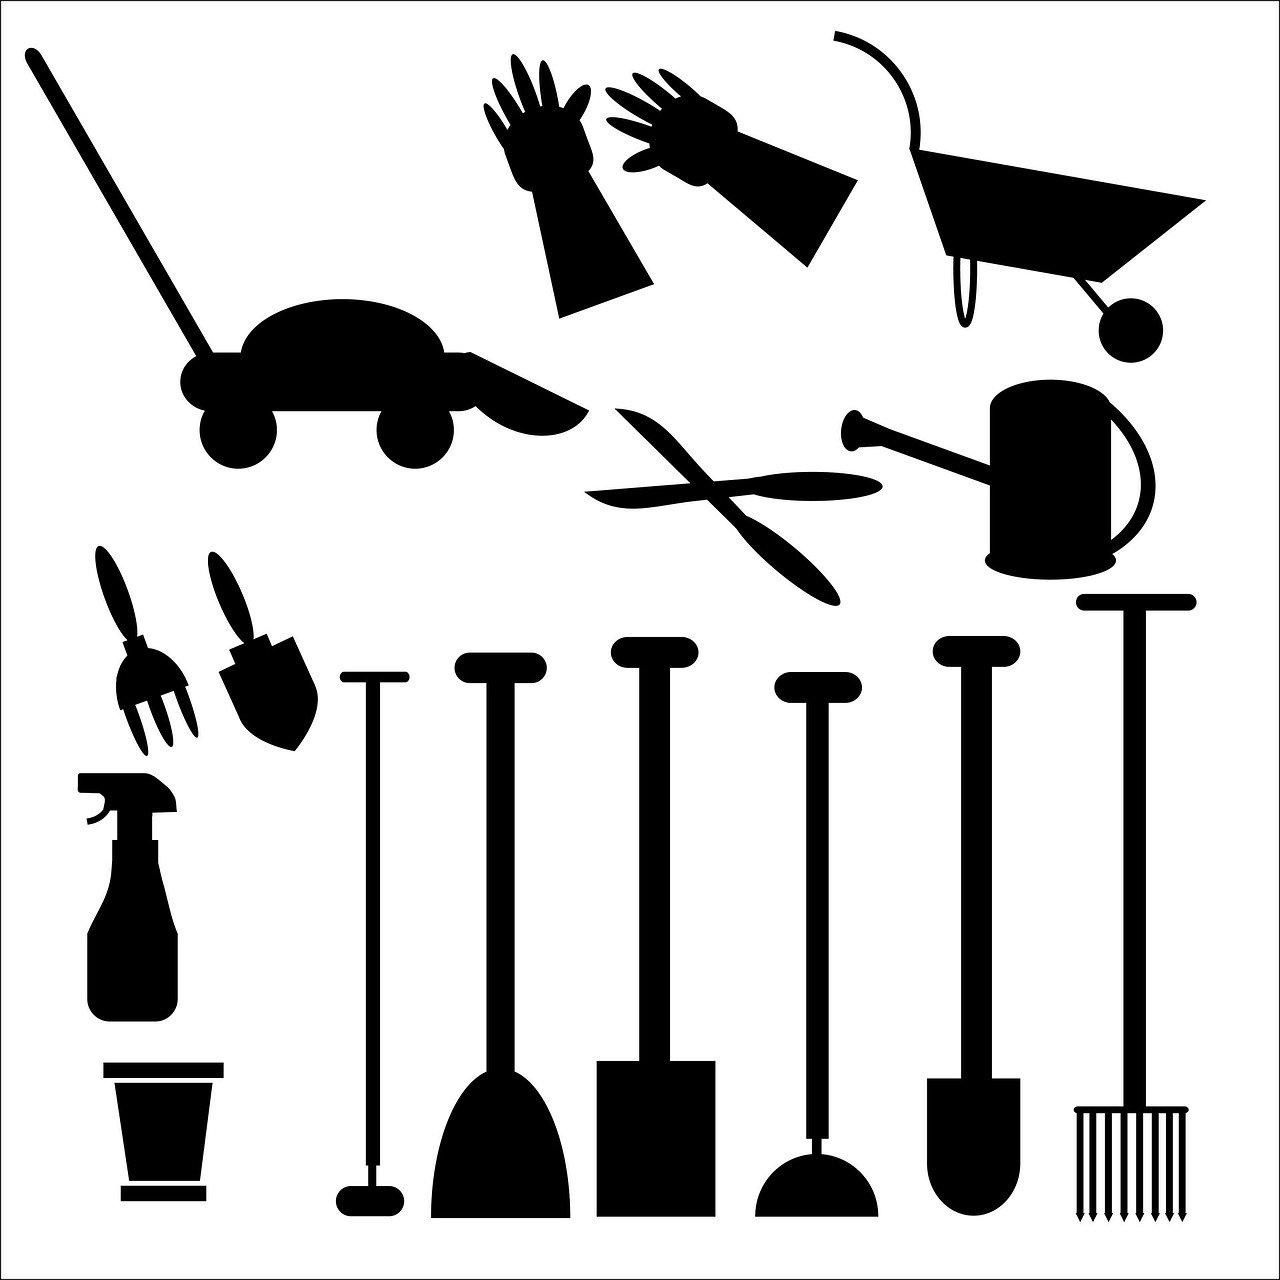 Garden Tools Gardening Free Image On Pixabay